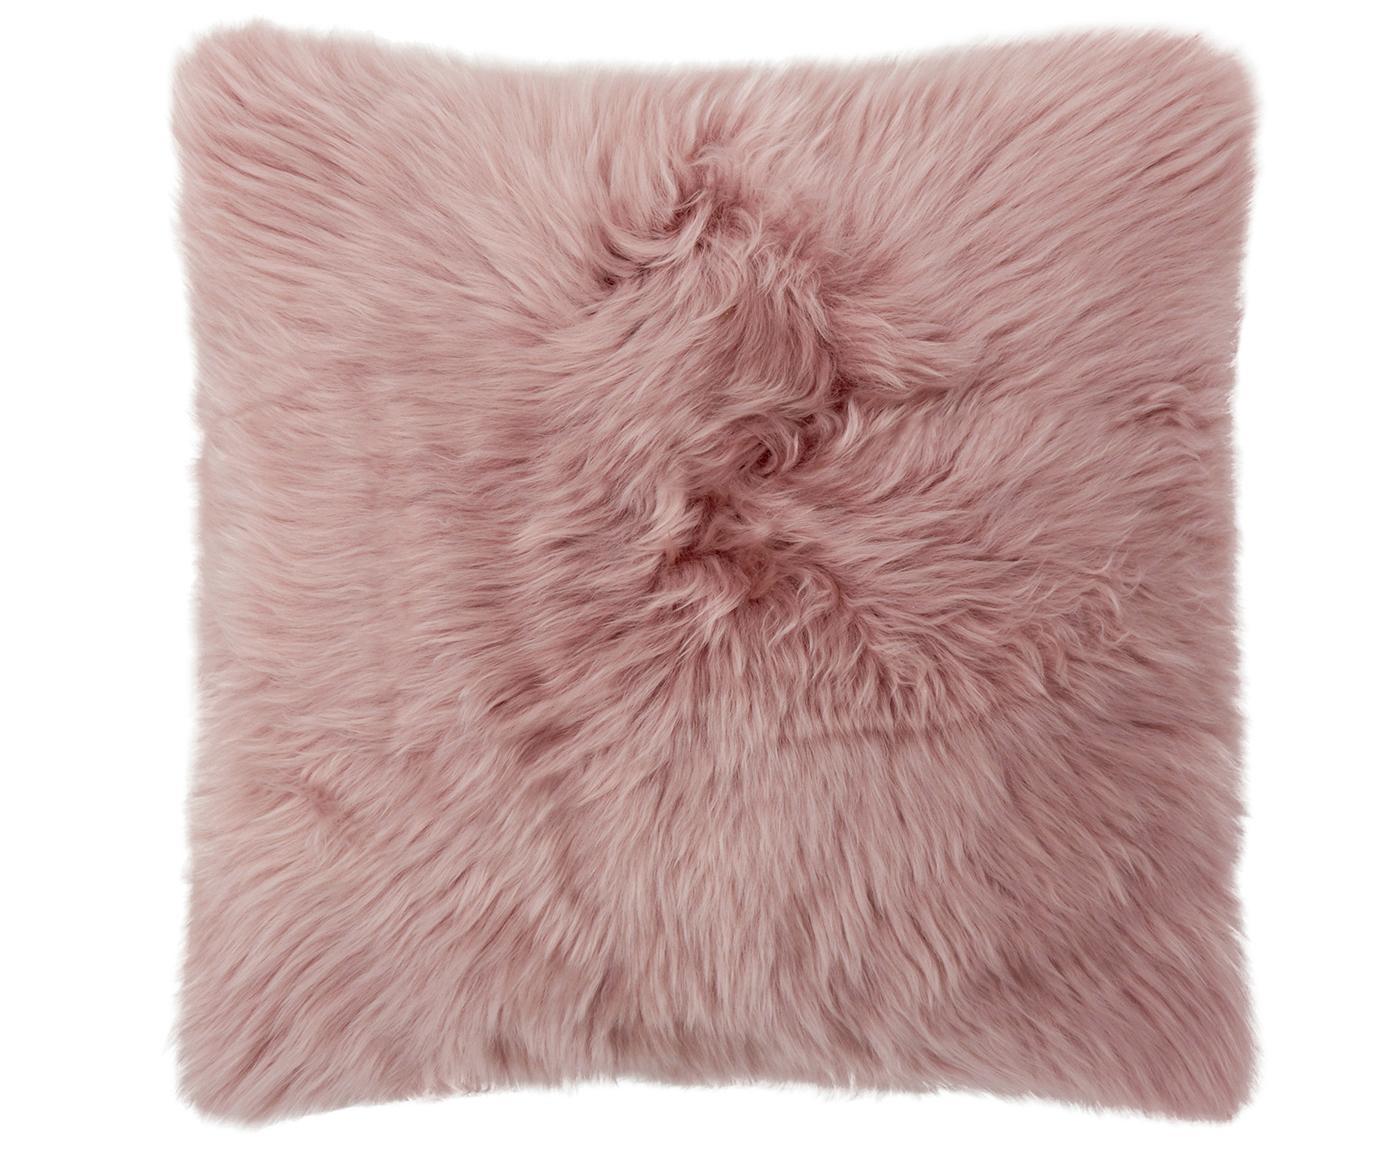 Schaffell-Kissenhülle Oslo, glatt, Vorderseite: 100% Schaffell, Rückseite: Leinen, Vorderseite: Rosa Rückseite: Hellgrau, 40 x 40 cm